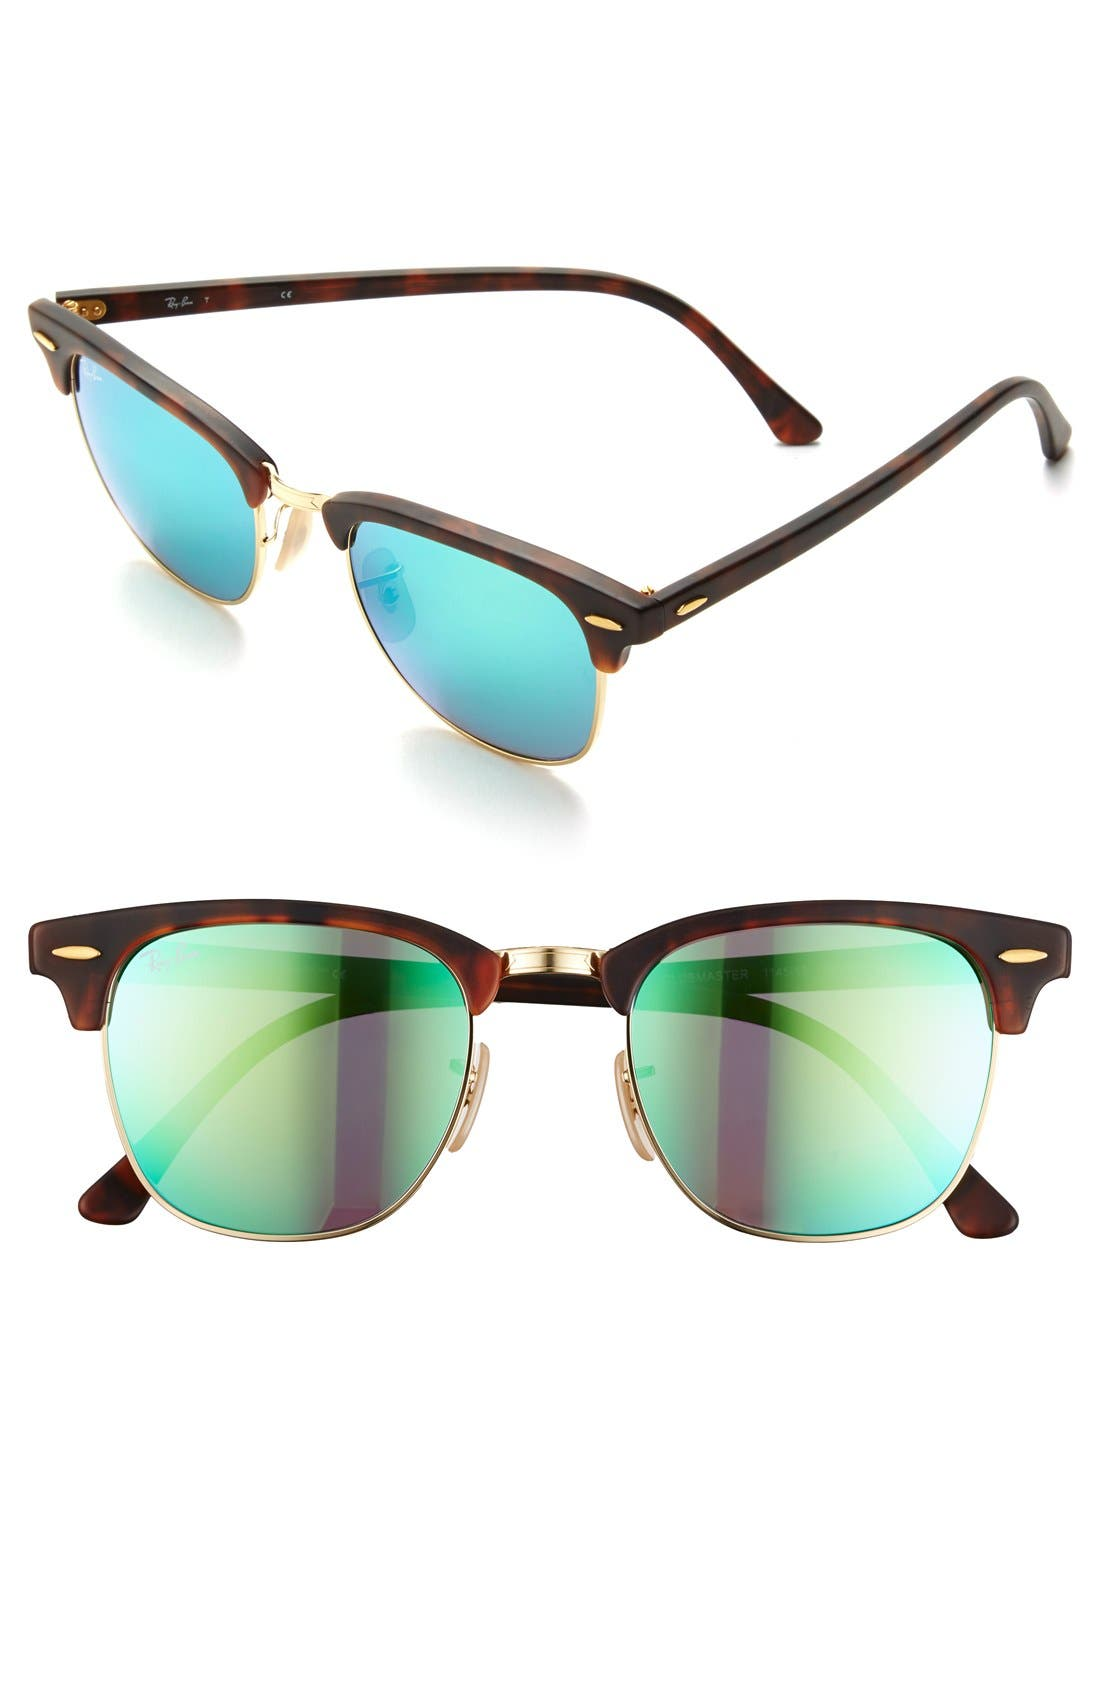 Ray-Ban Flash Clubmaster 51Mm Sunglasses - Tortoise/ Green Flash